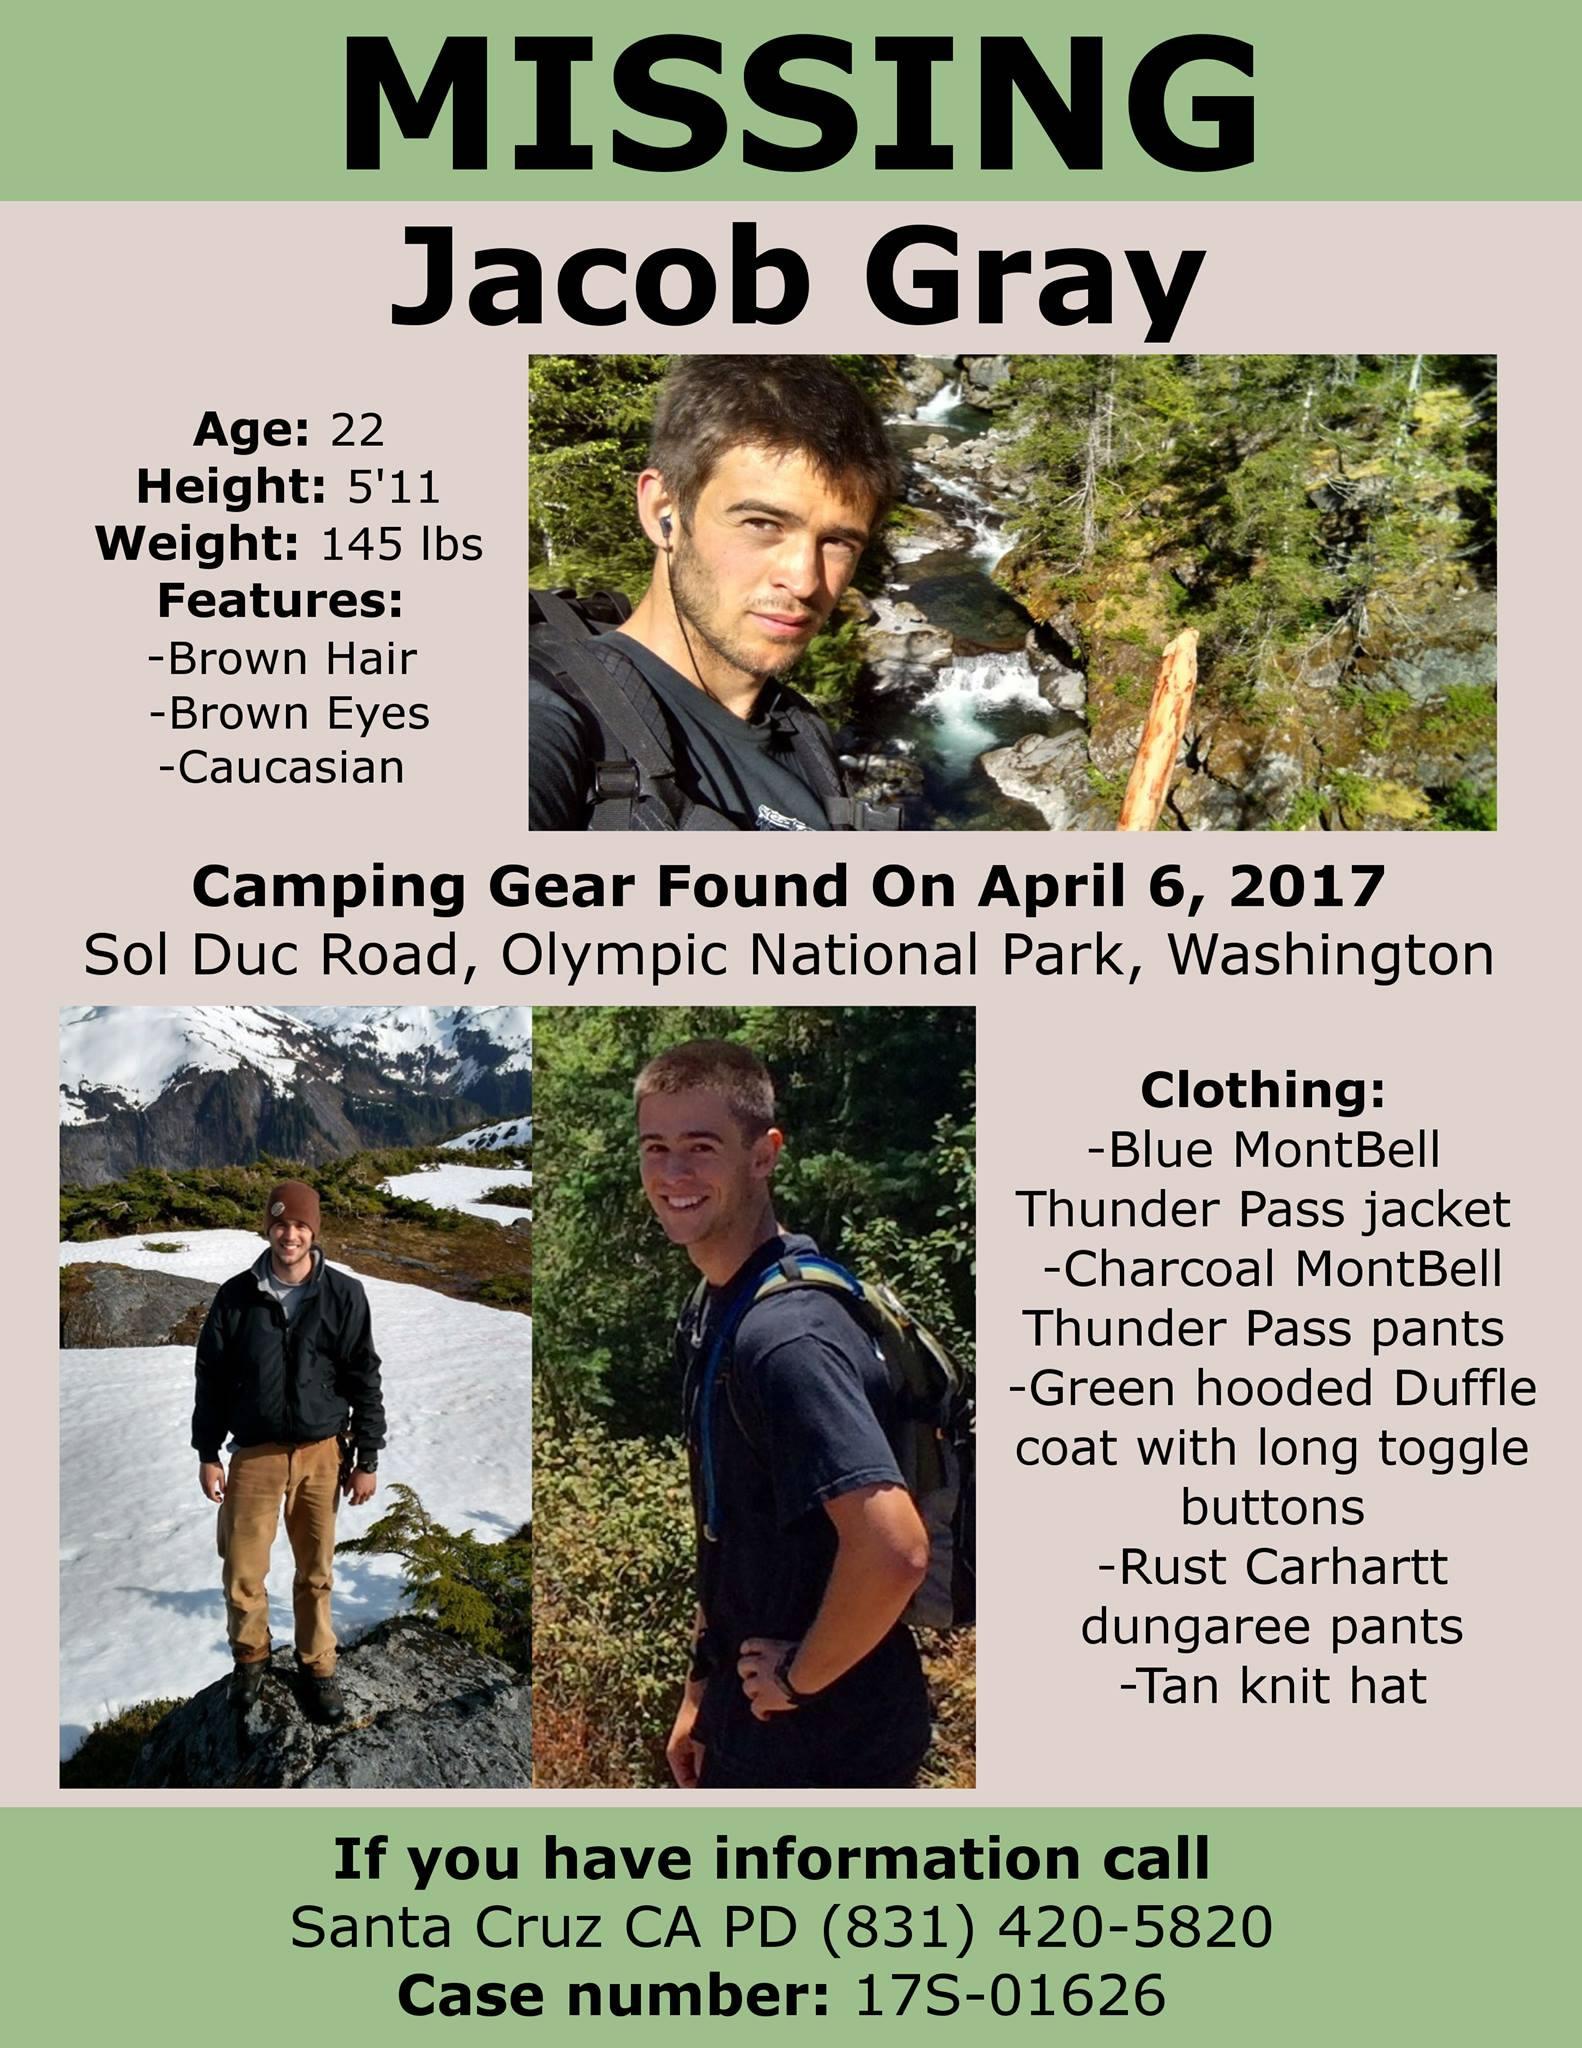 Jacob Grays MissingPerson Website – Missing Person Flyer